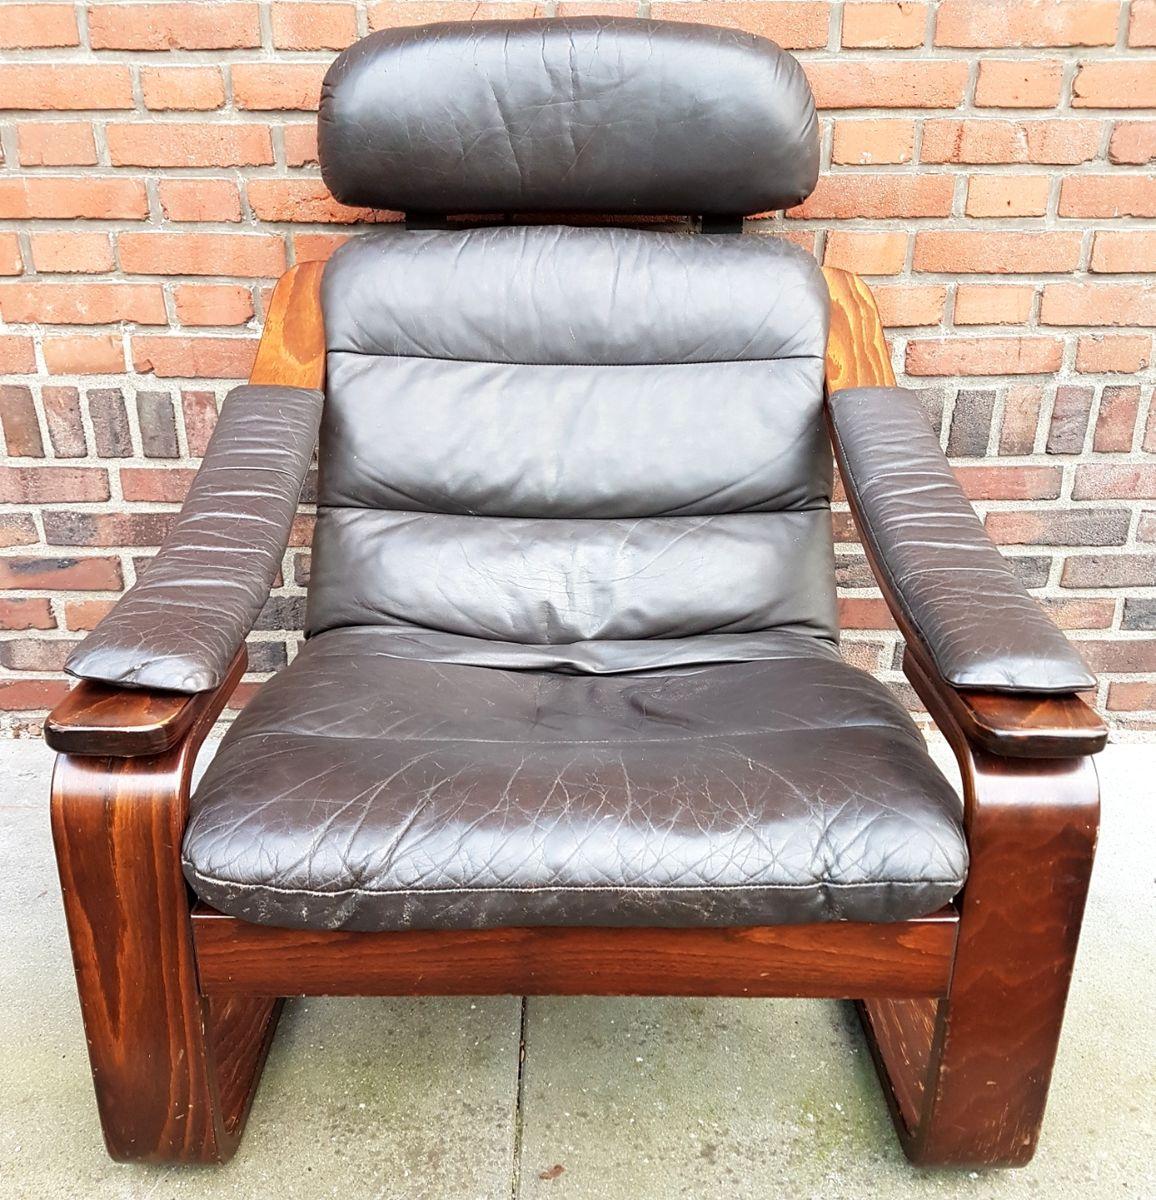 skandinavischer sessel aus bugholz 1978 bei pamono kaufen. Black Bedroom Furniture Sets. Home Design Ideas